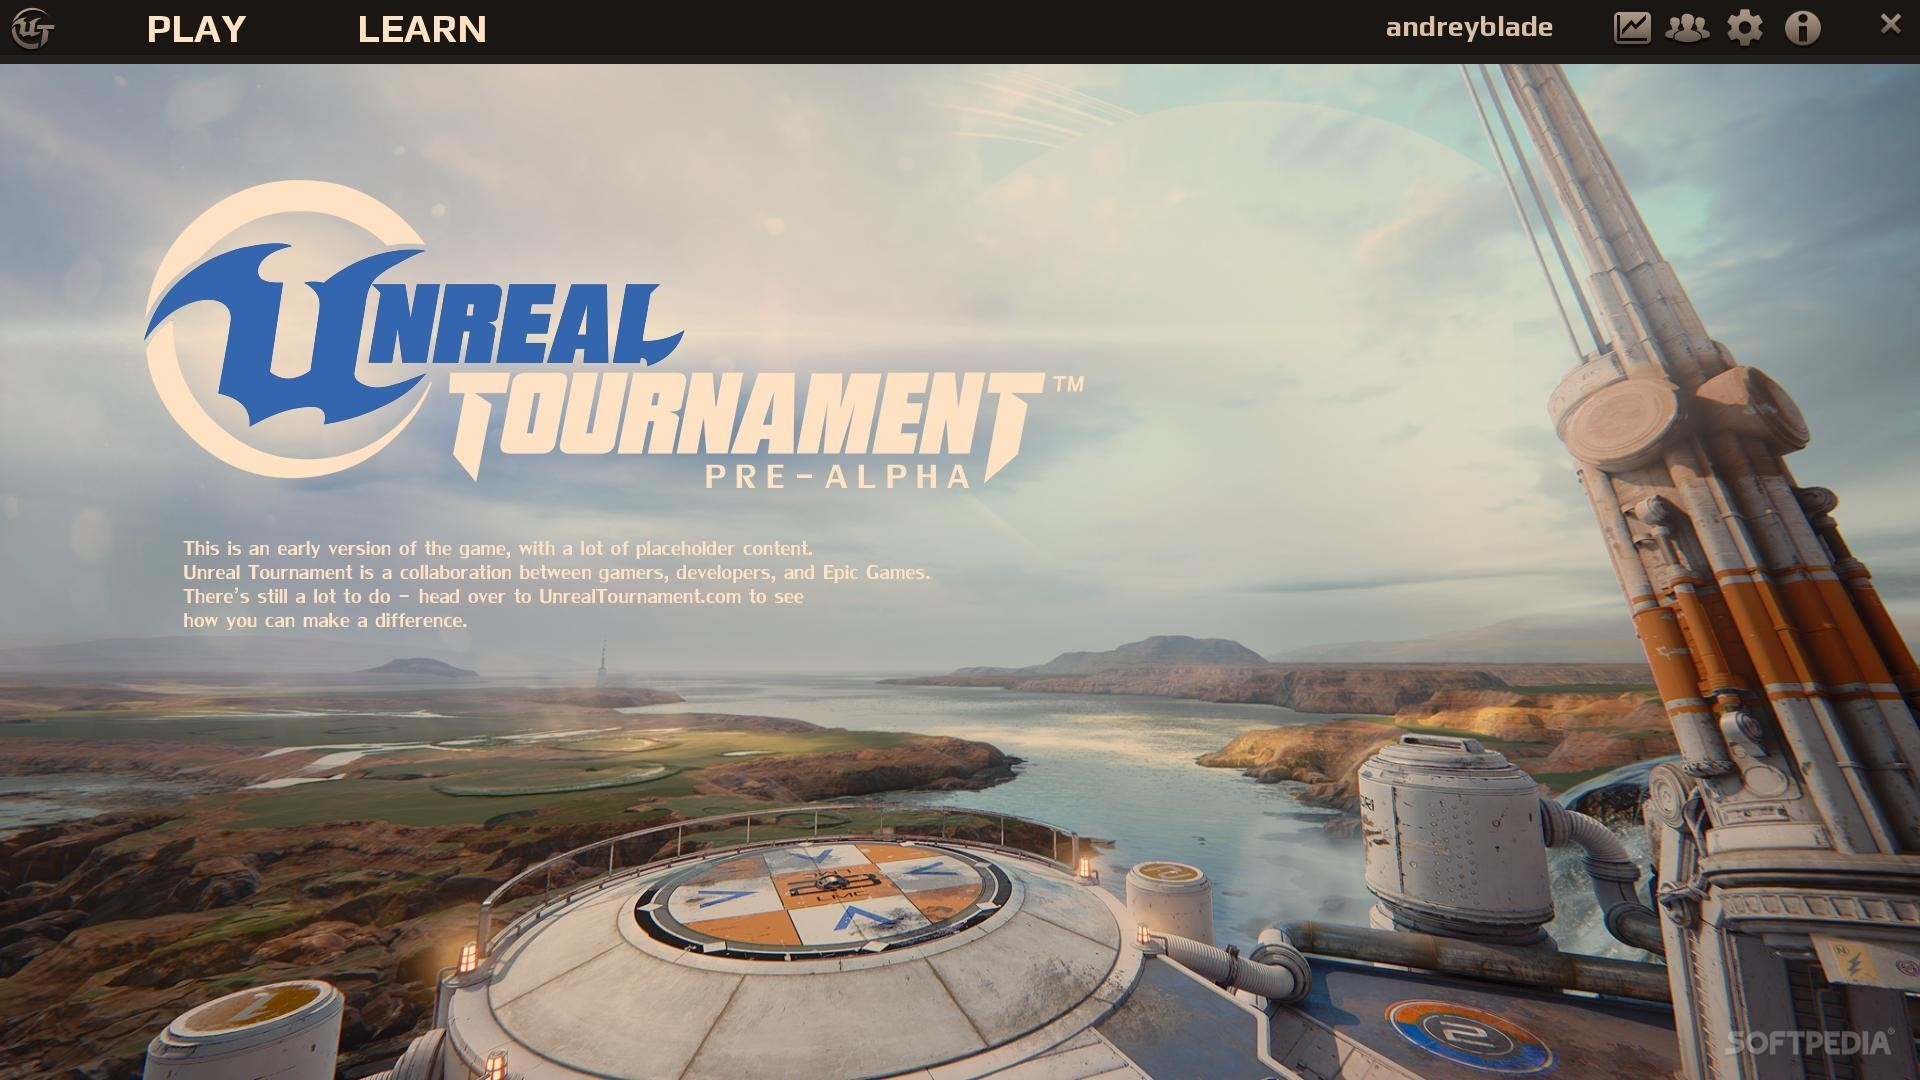 unreal tournament 4 free download full version pc